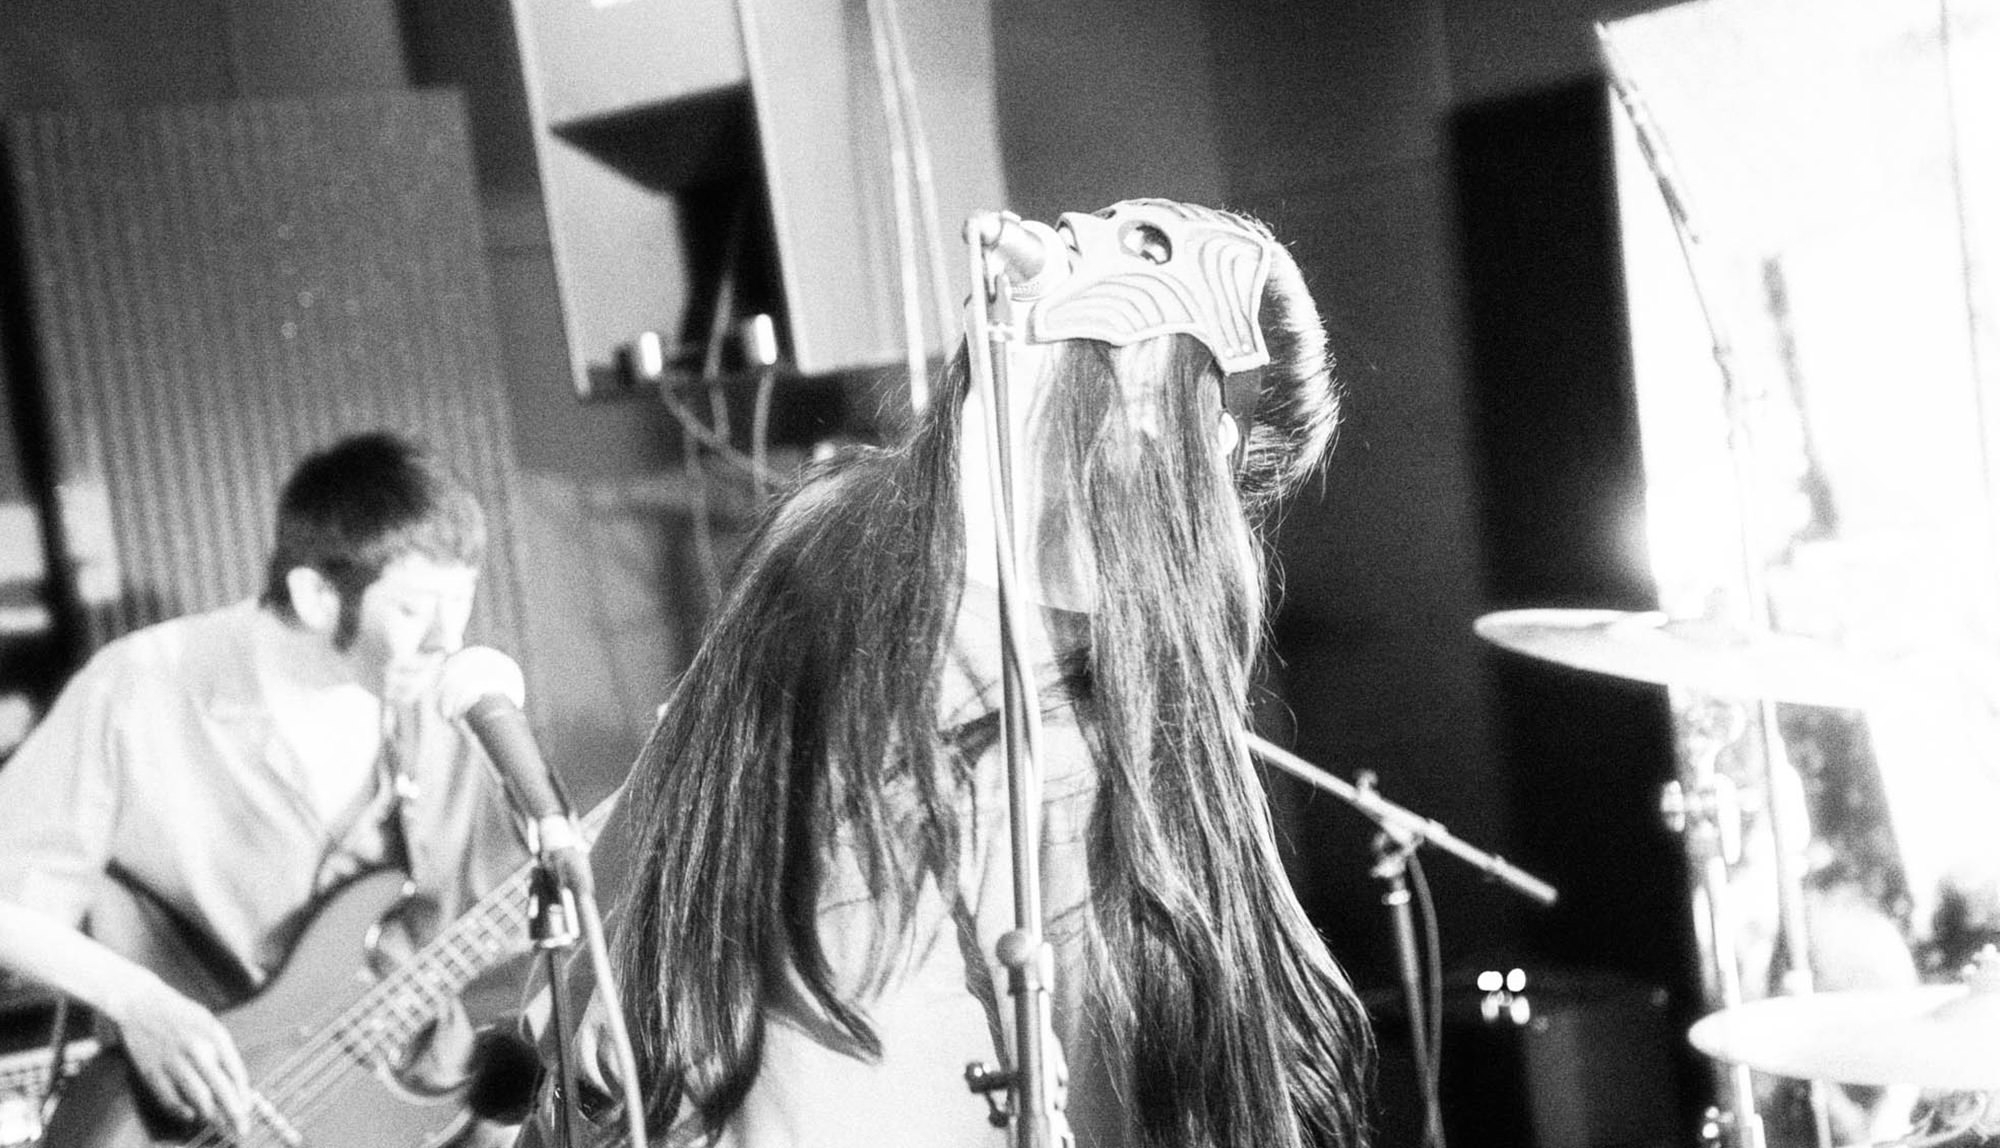 SUPER DOMMUNE|―わたしたちの心を生かしてくれる音― GEZAN・COMPUMA・Mars89・JUN TAKAHASHI (UNDERCOVER)